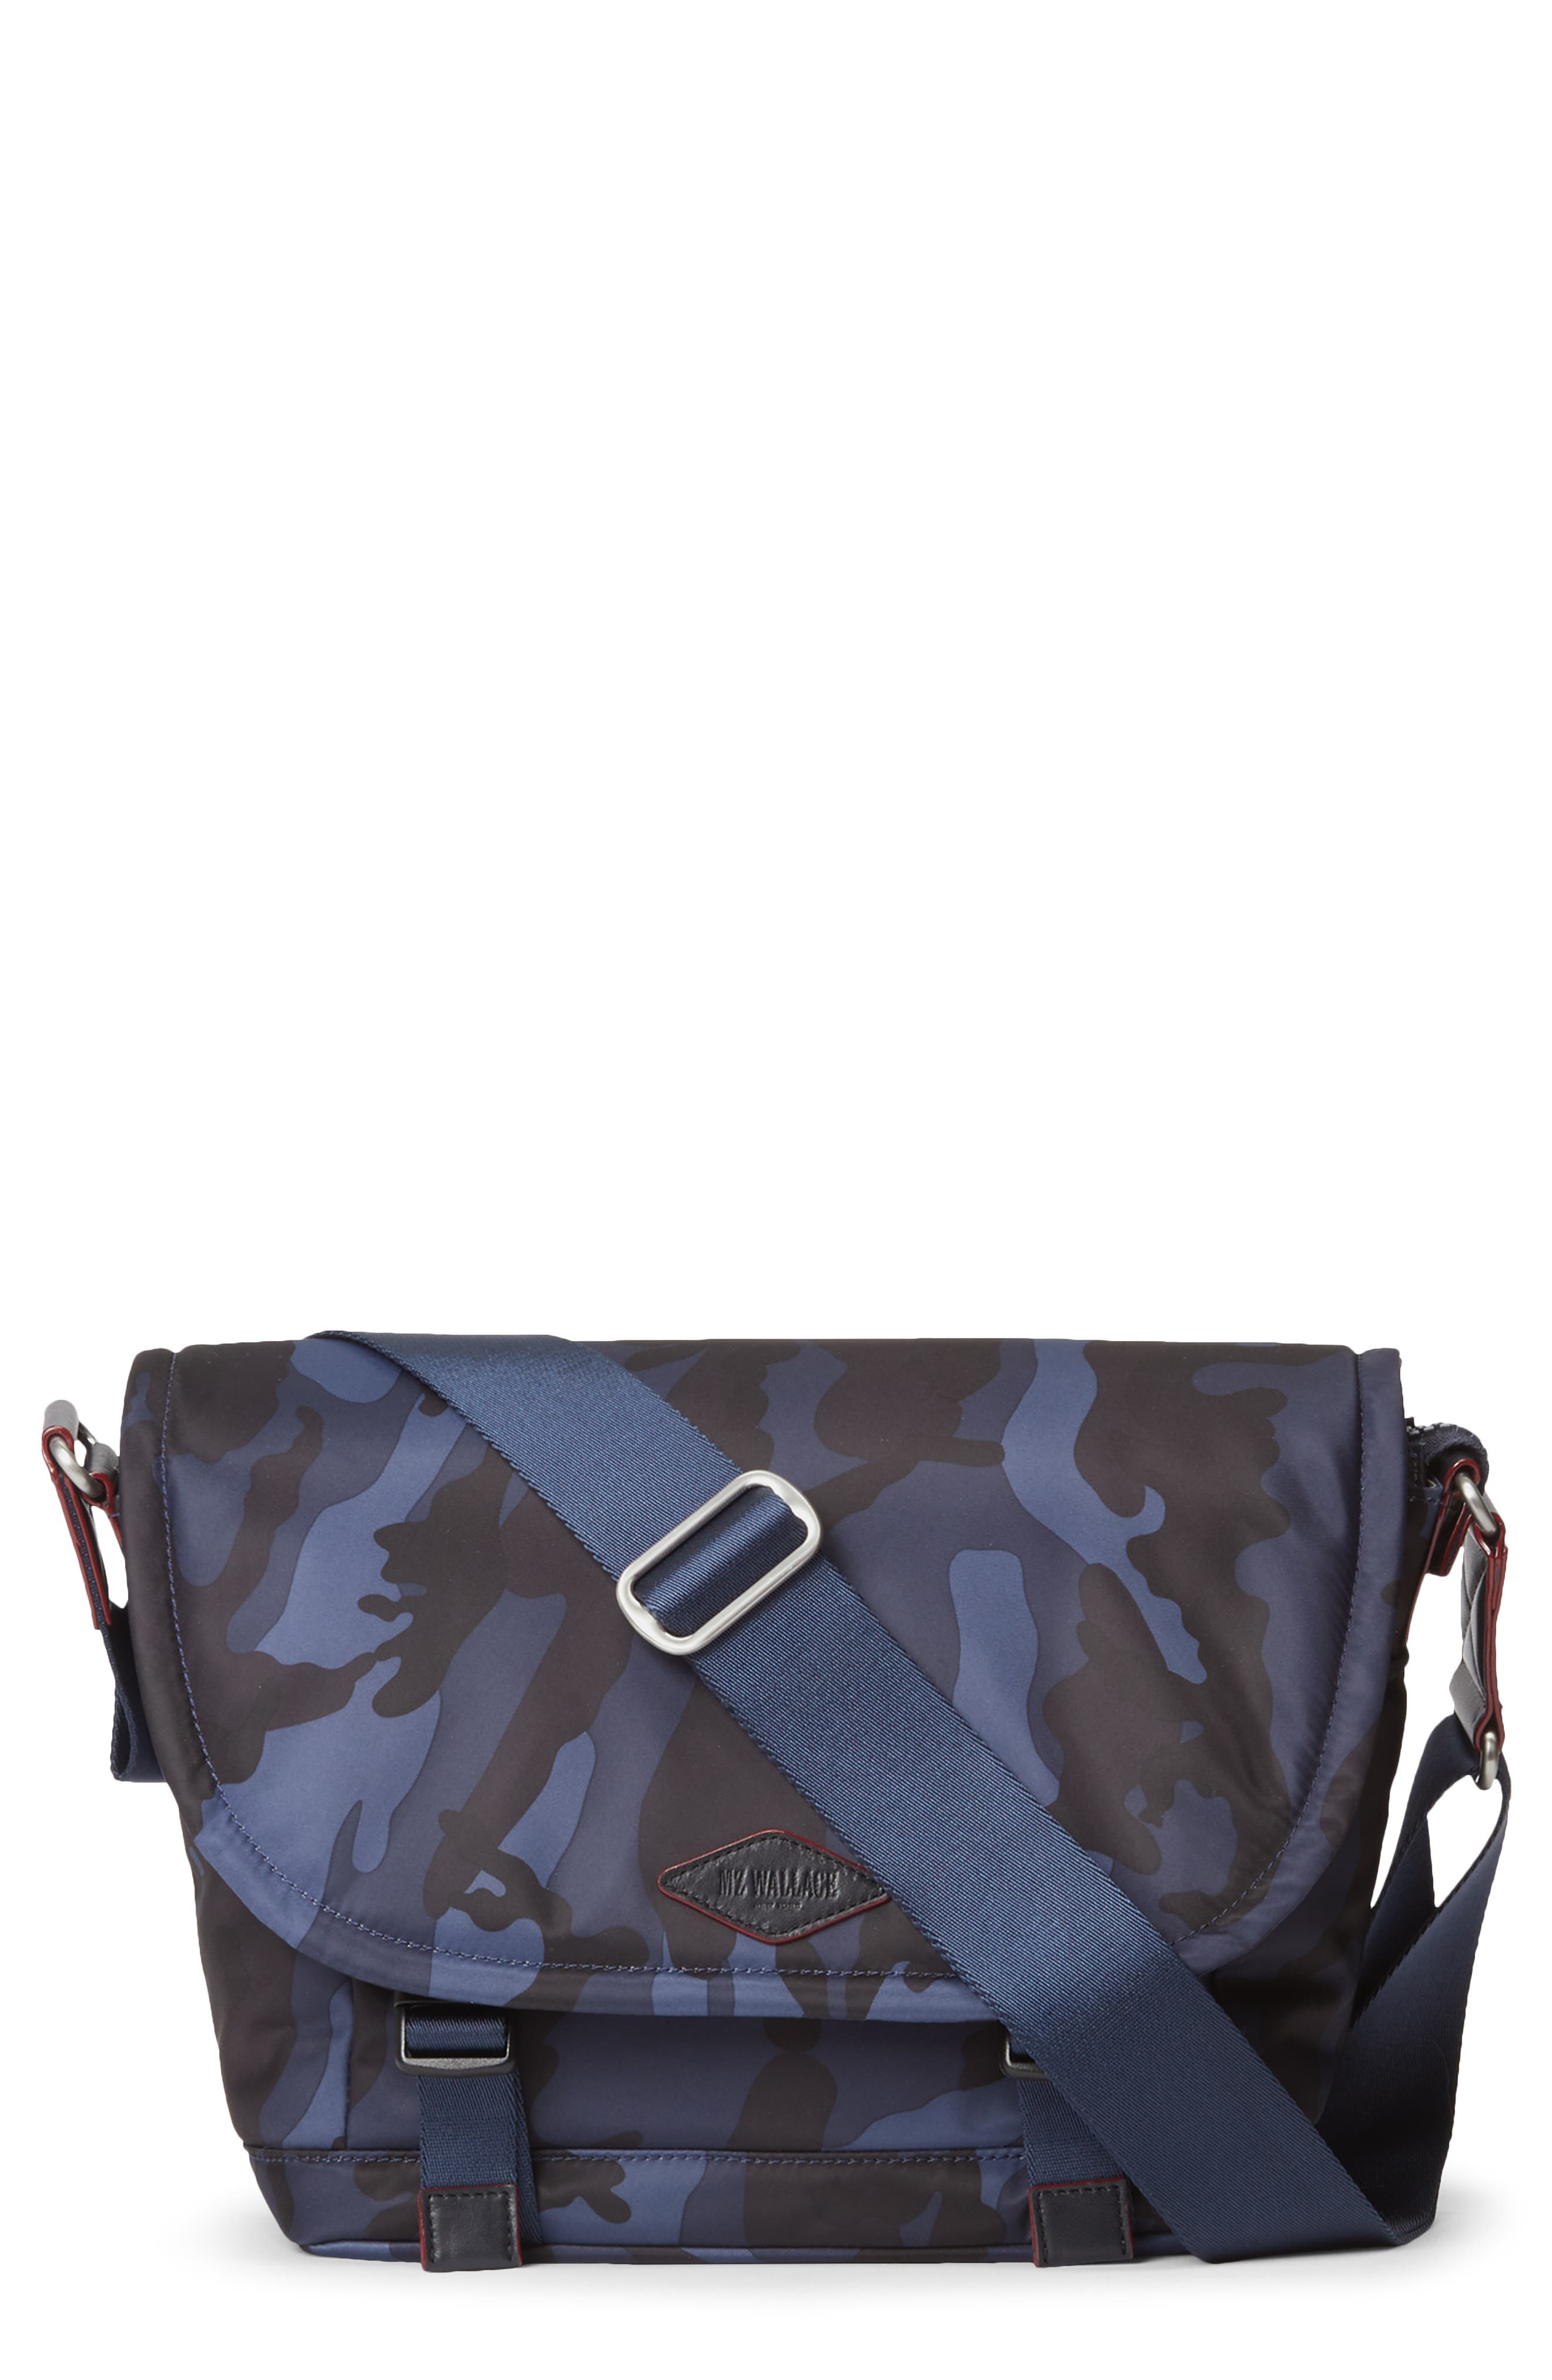 Mz Wallace Small Bleecker Nylon Messenger Bag - Blue